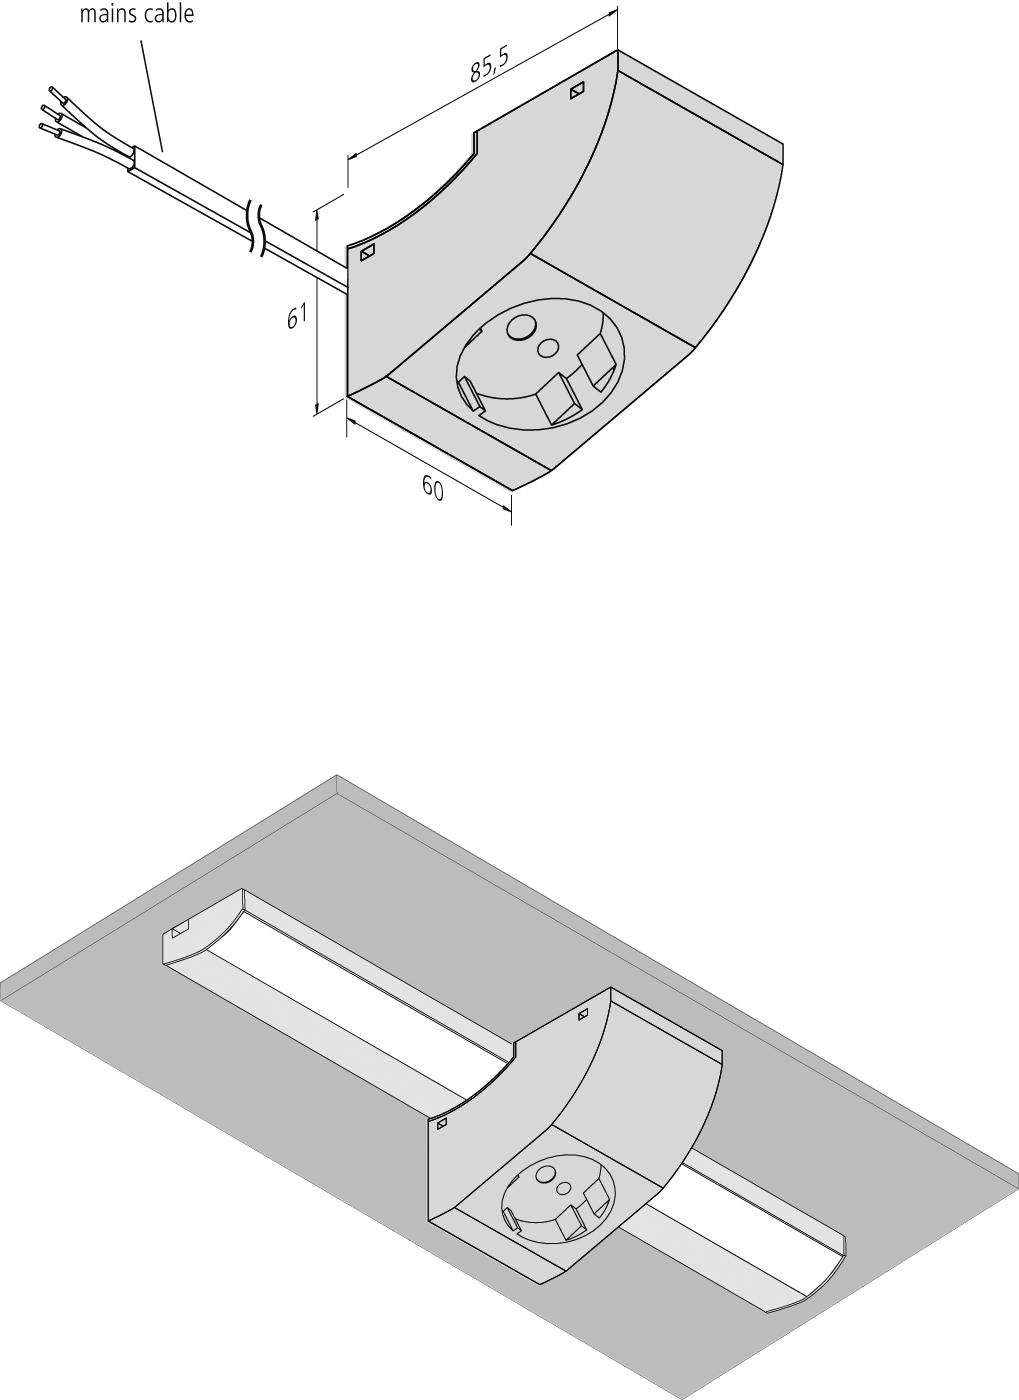 Preview: Steckdose-LED-ModuLite-F_en